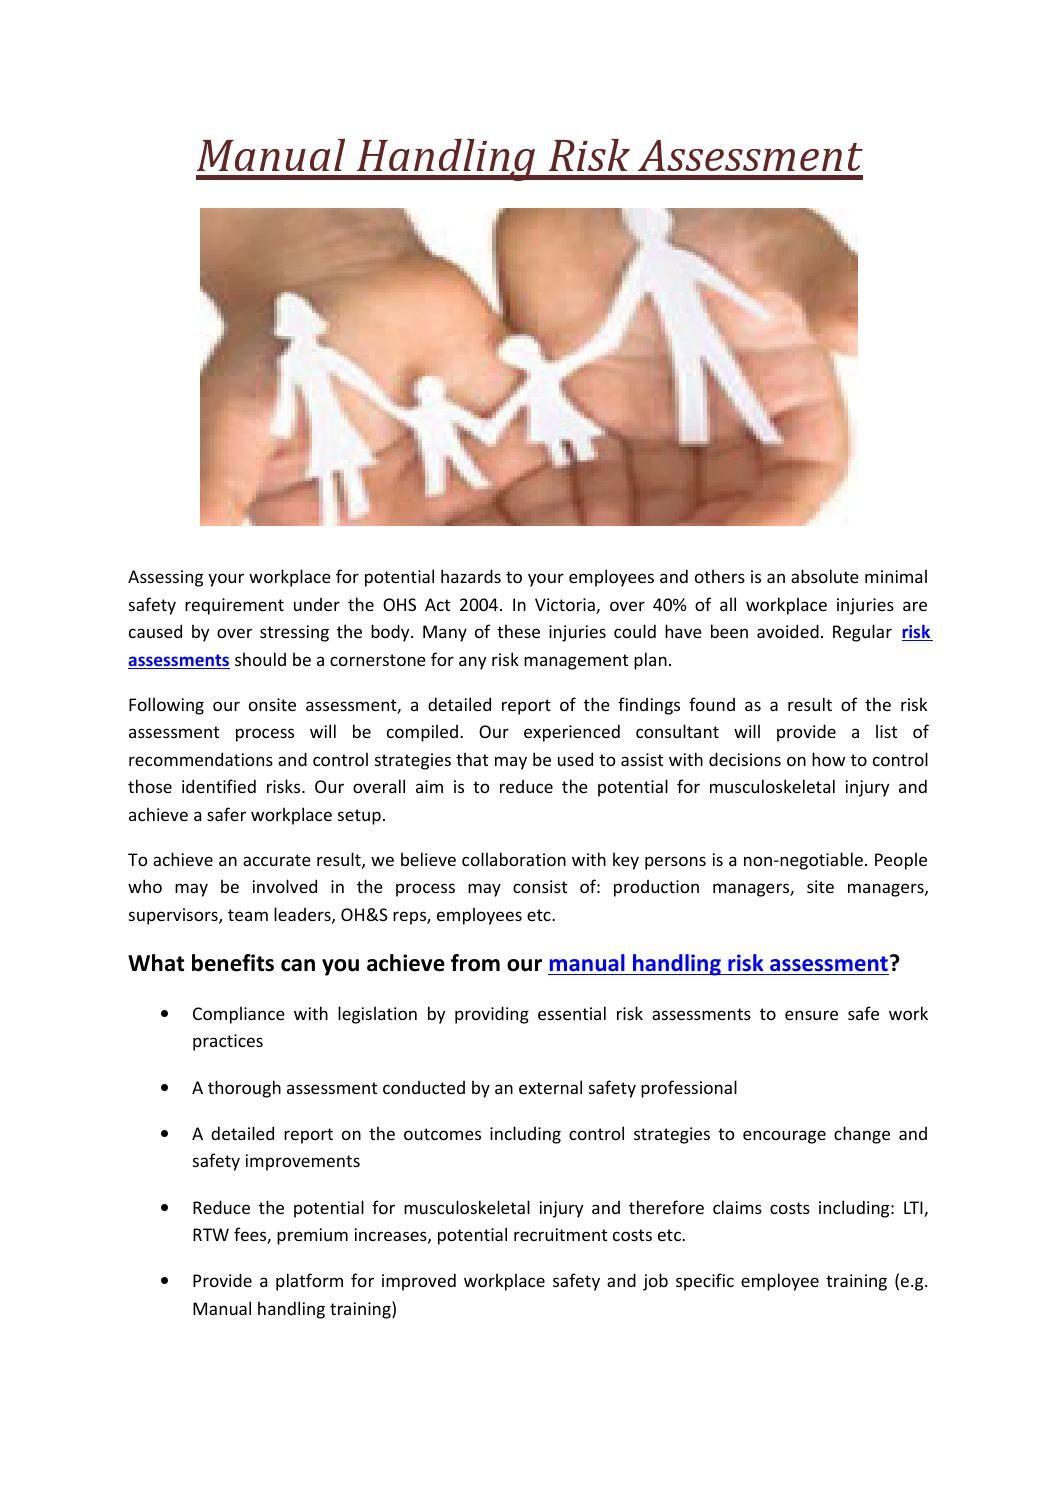 Manual Handling Risk Assessment Manual Handling